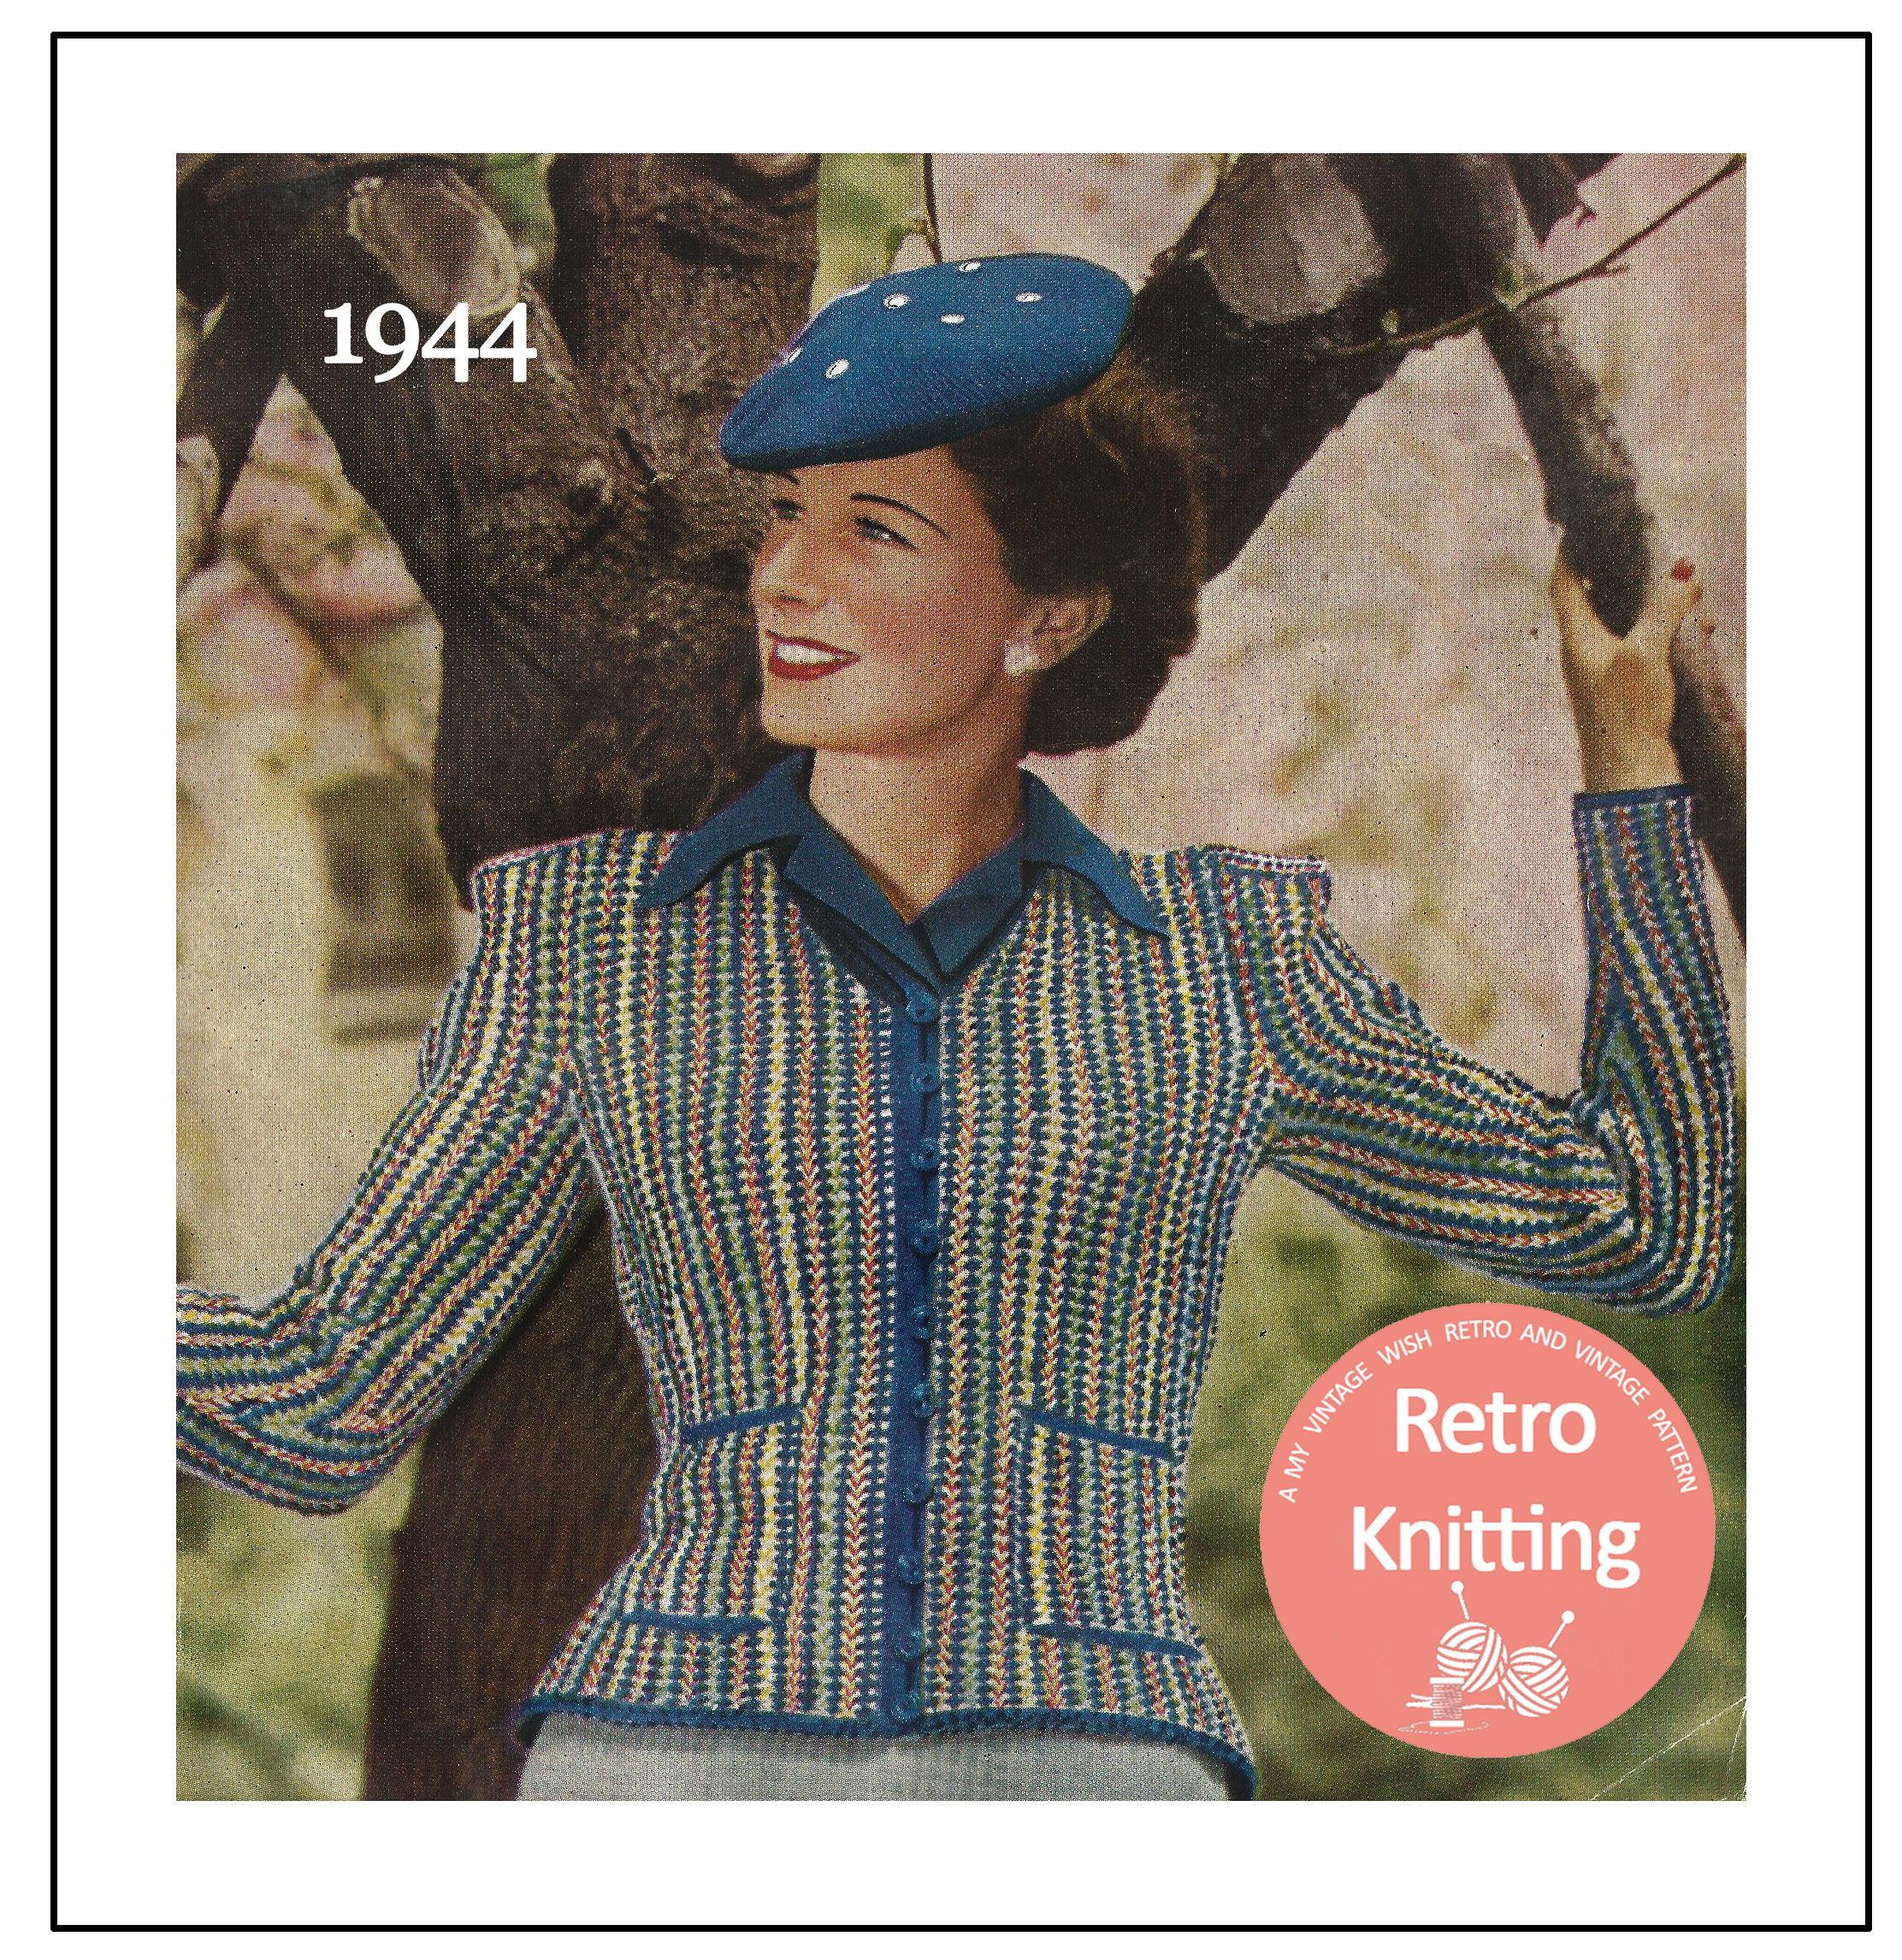 0c557897f 1940 s Lady s Jacket and Beret Vintage Knitting Pattern - PDF Knitting  Pattern - PDF Instant Download from MyVintageWish on Etsy Studio